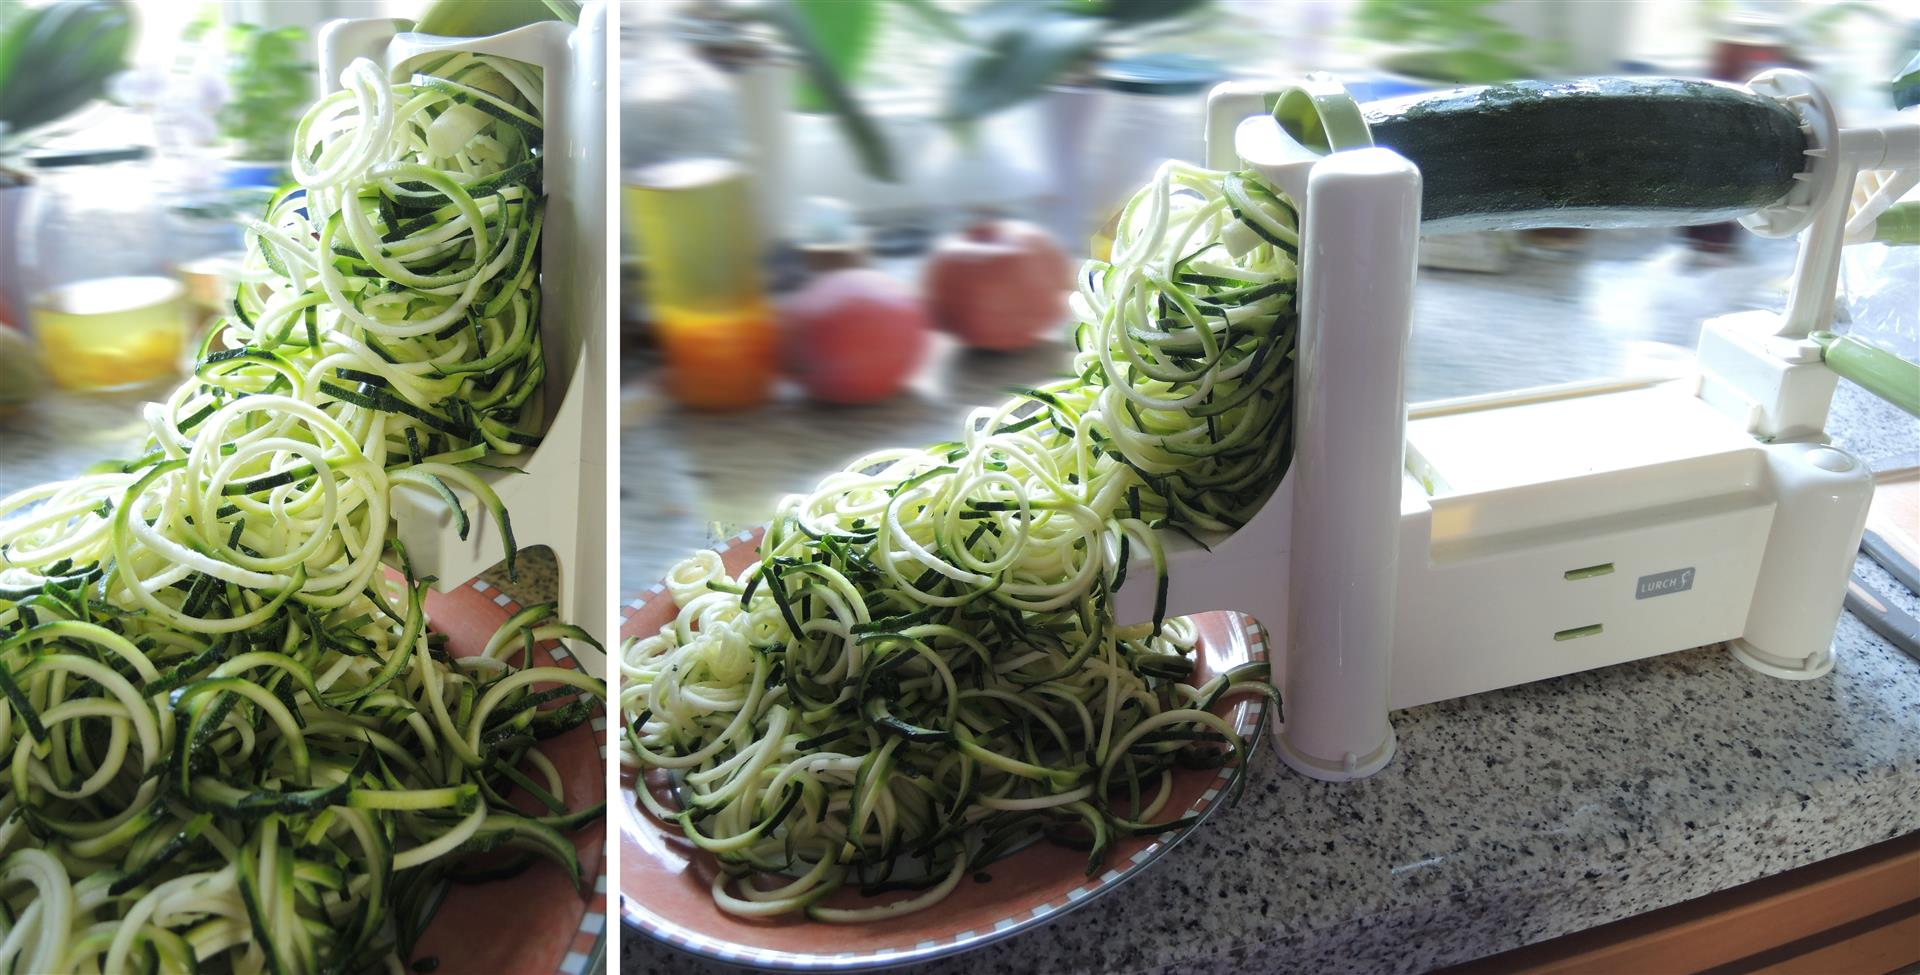 zucchini spaghetti mit frischer tomatenso e vegan chilirosen. Black Bedroom Furniture Sets. Home Design Ideas